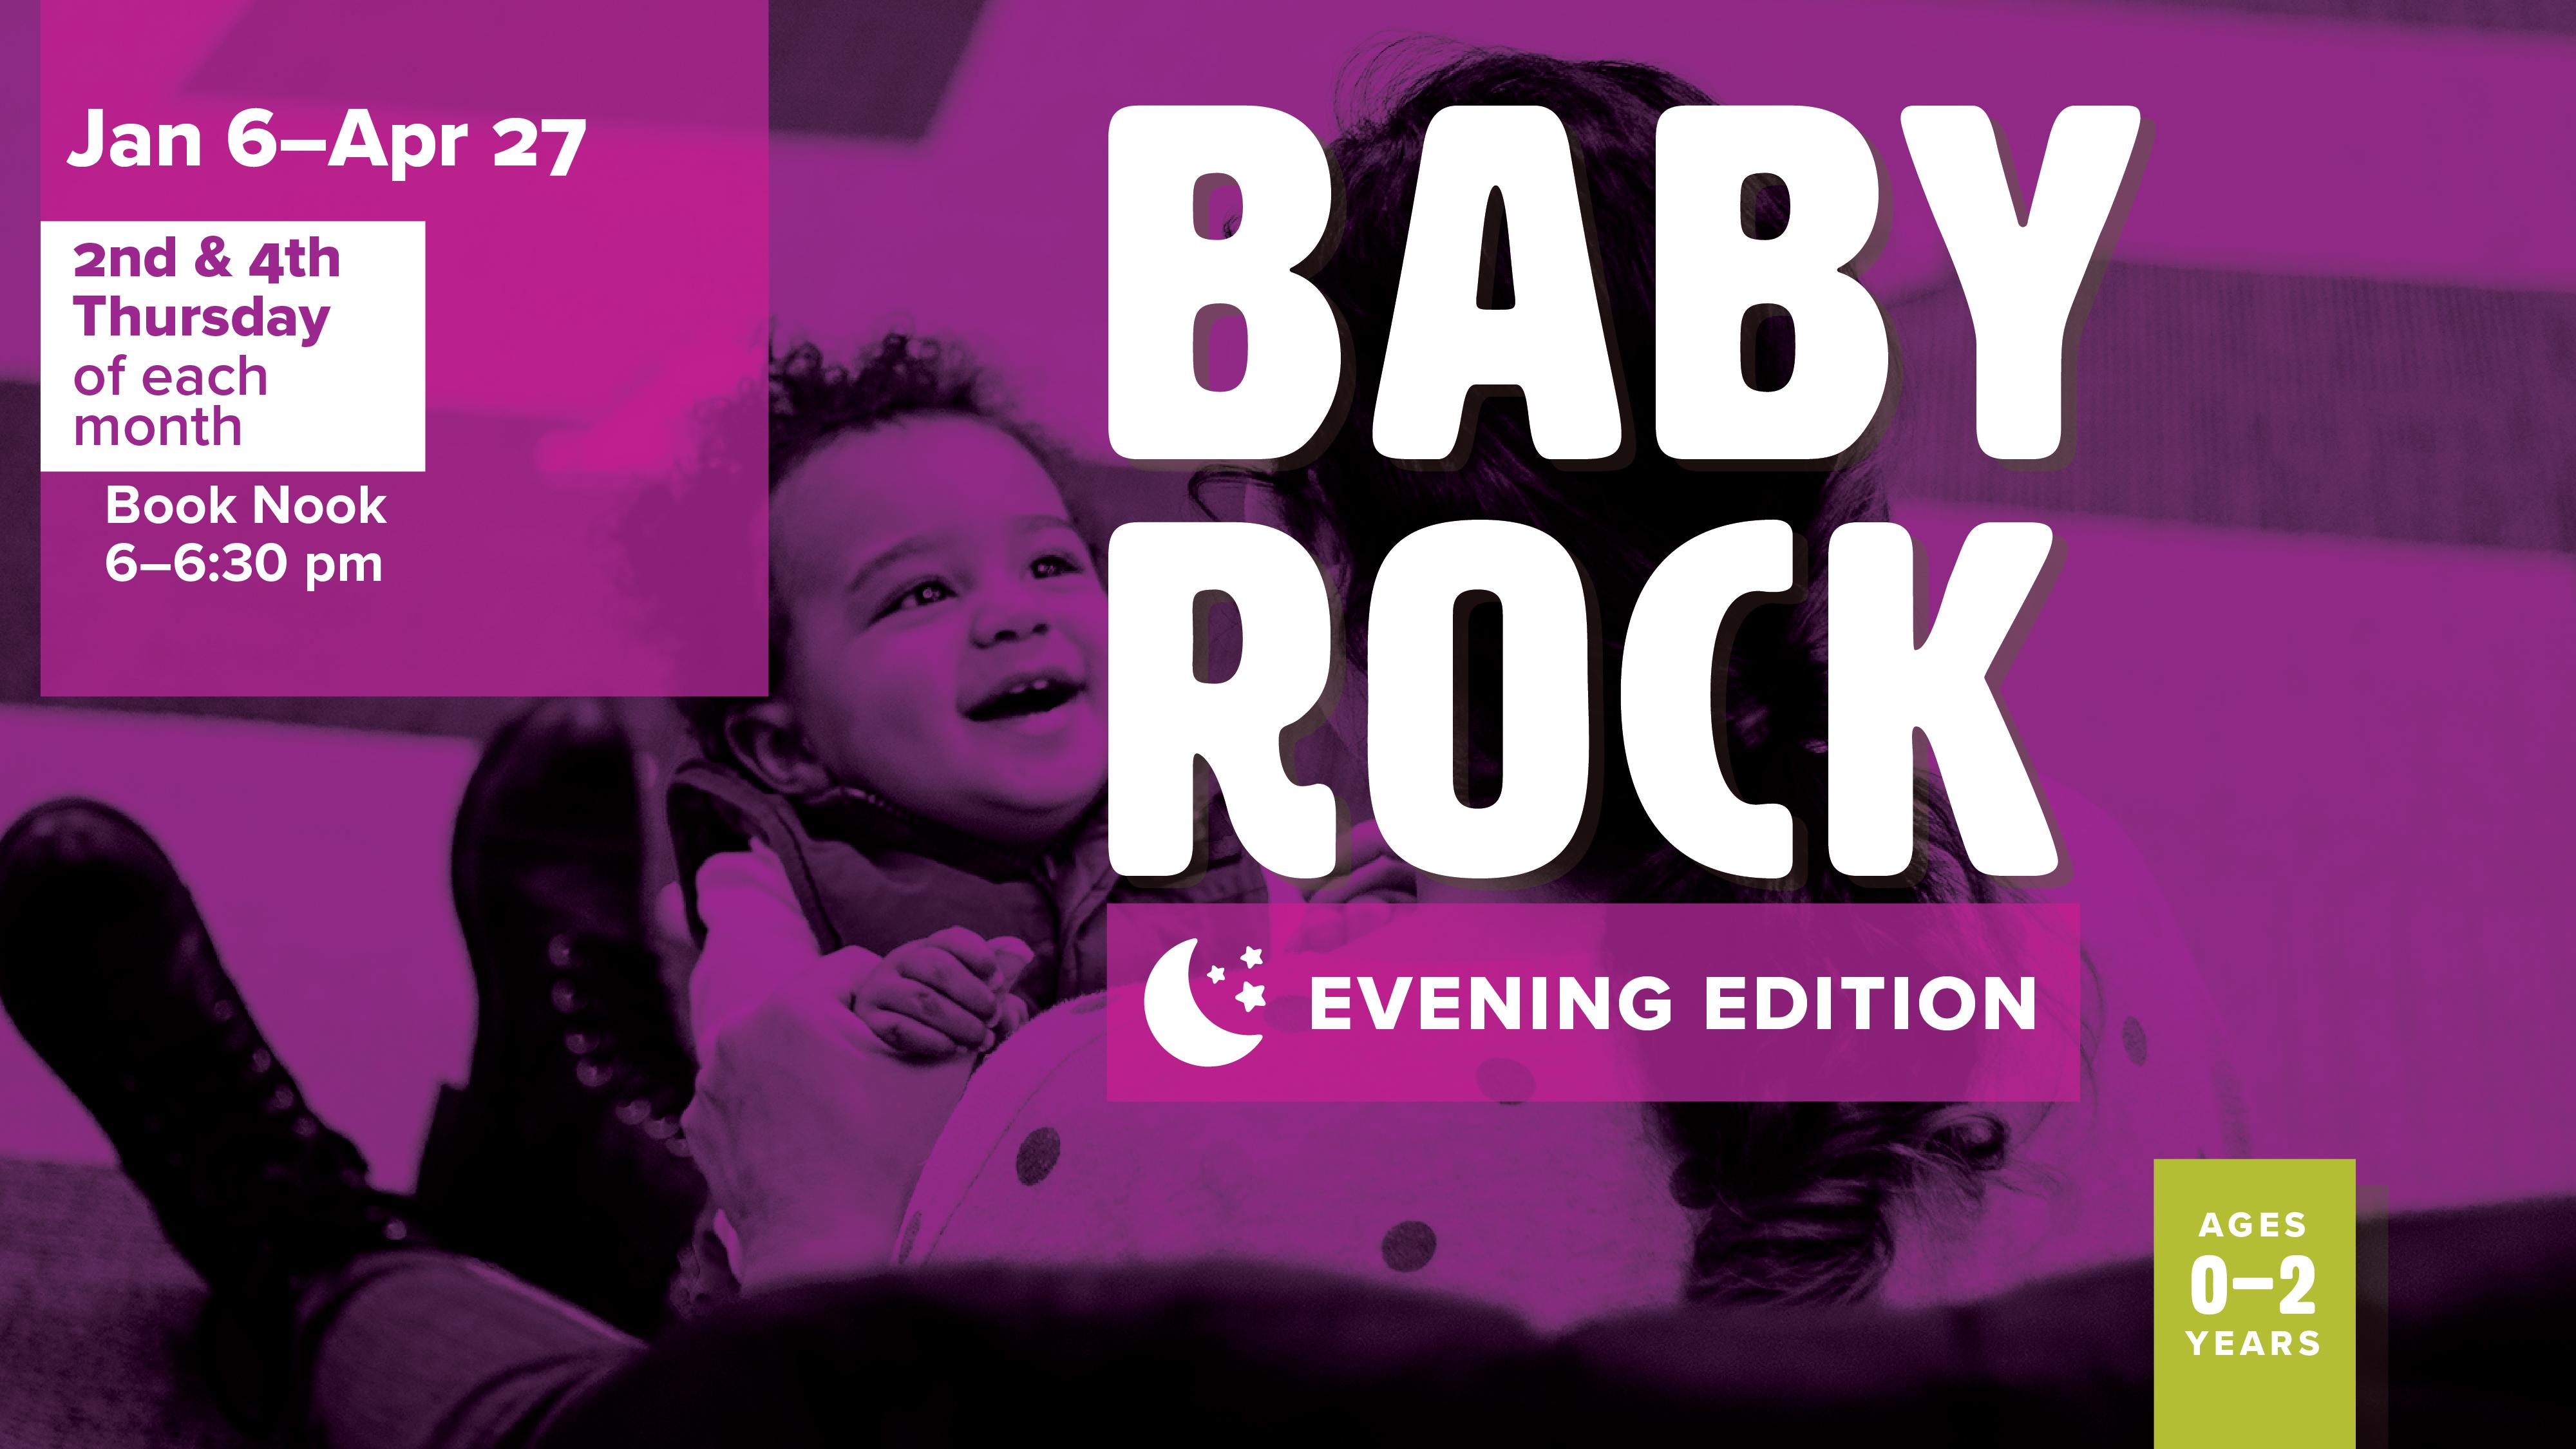 baby rock evening edition